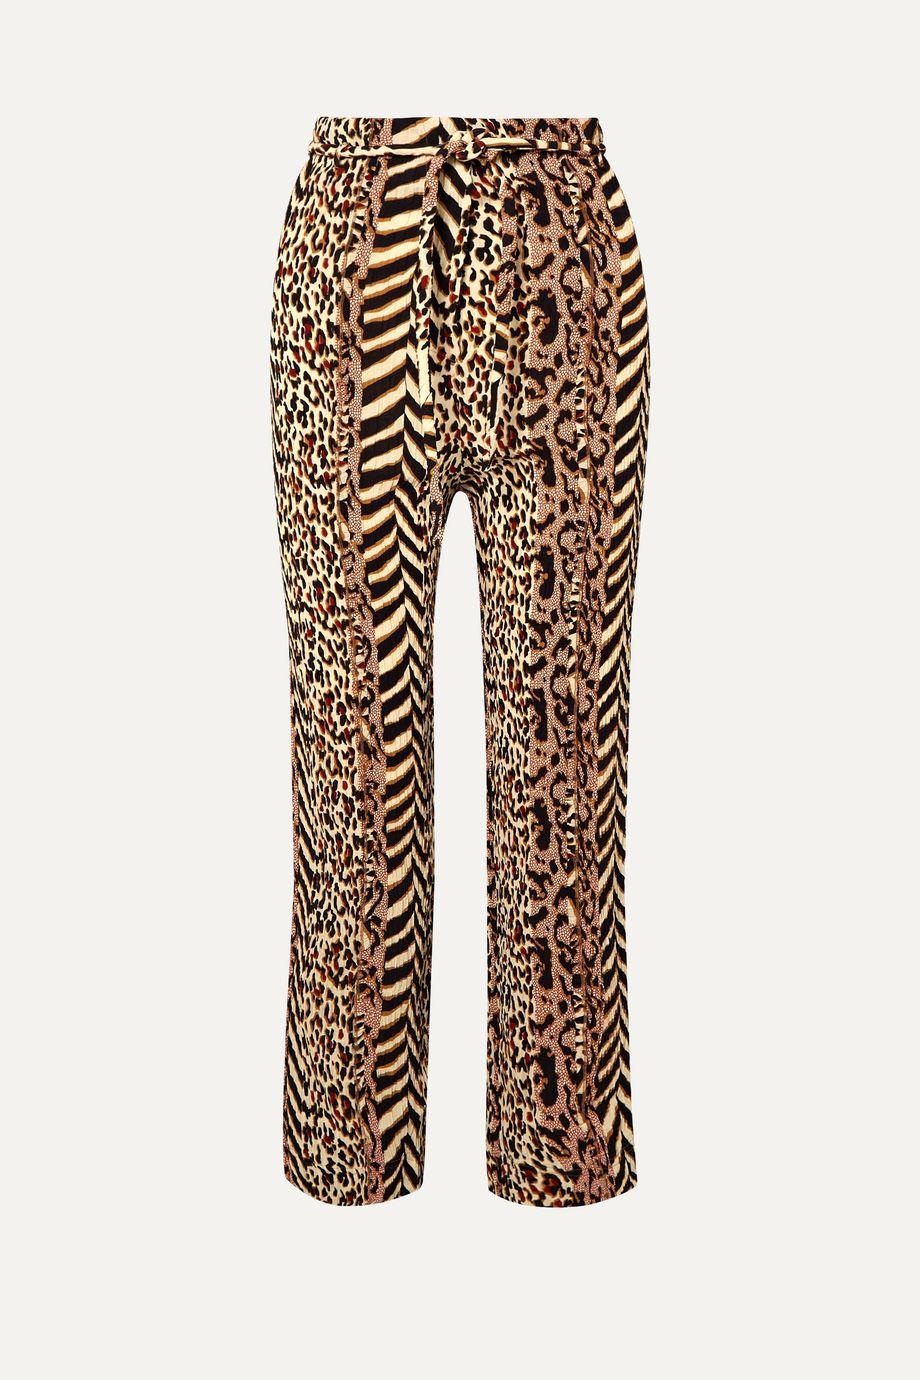 Nanushka Luma paneled printed crinkled-voile straight-leg pants